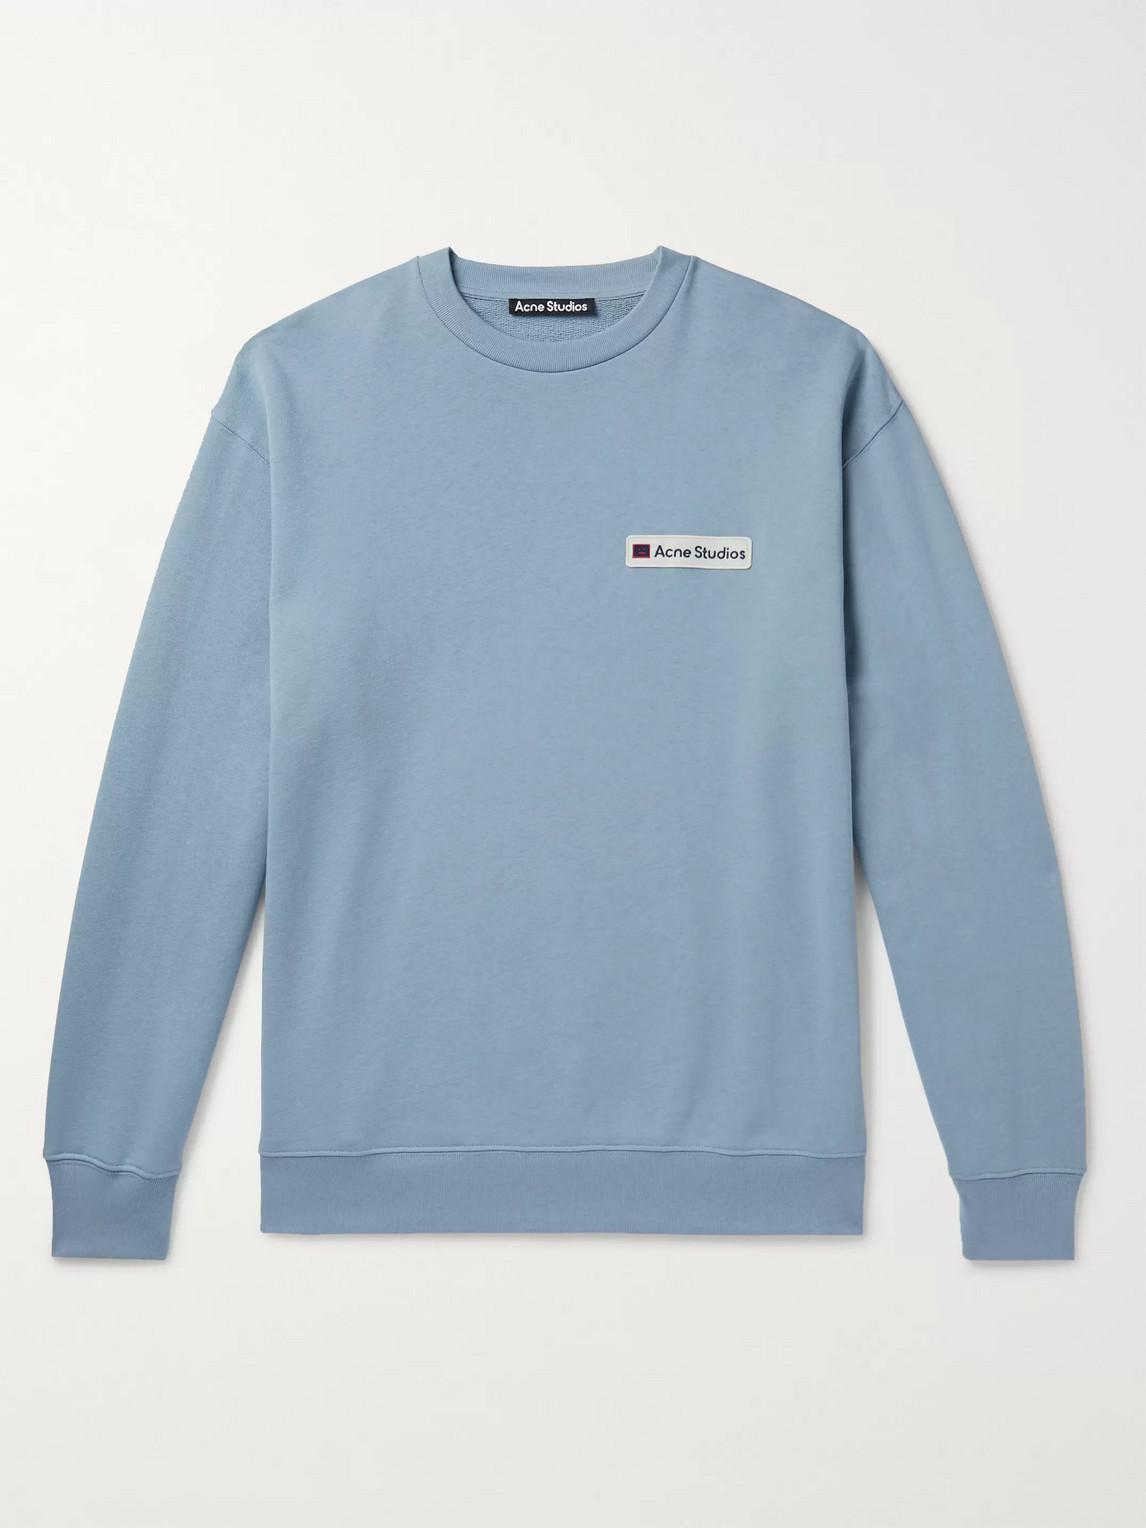 acne studios - logo-appliquã©d loopback cotton-jersey sweatshirt - men - blue